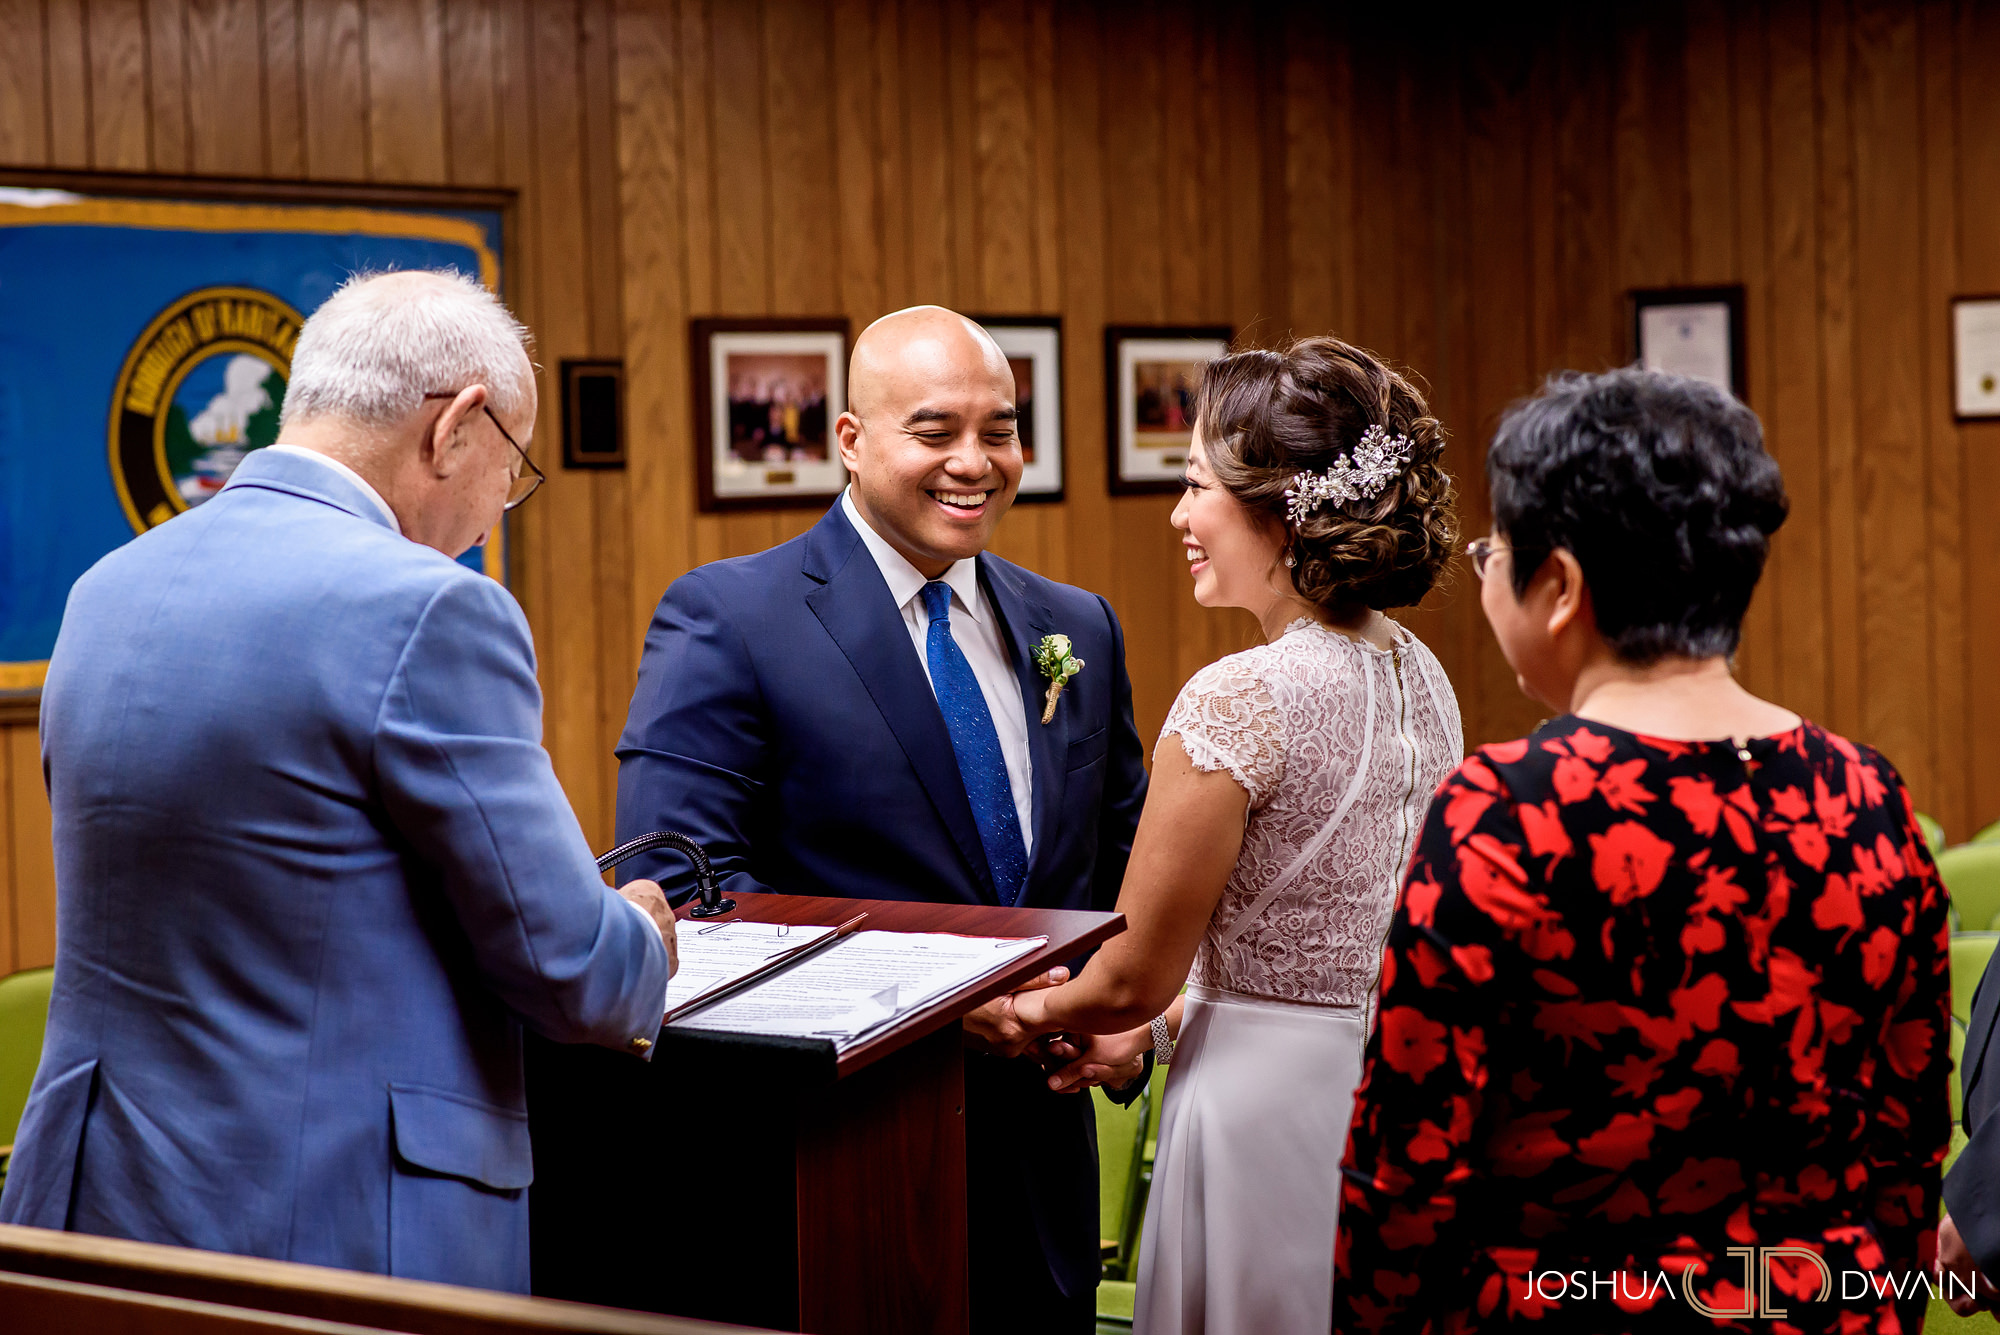 yanshu-michael-23-somerset-courthouse-elopement-wedding-joshua-dwain